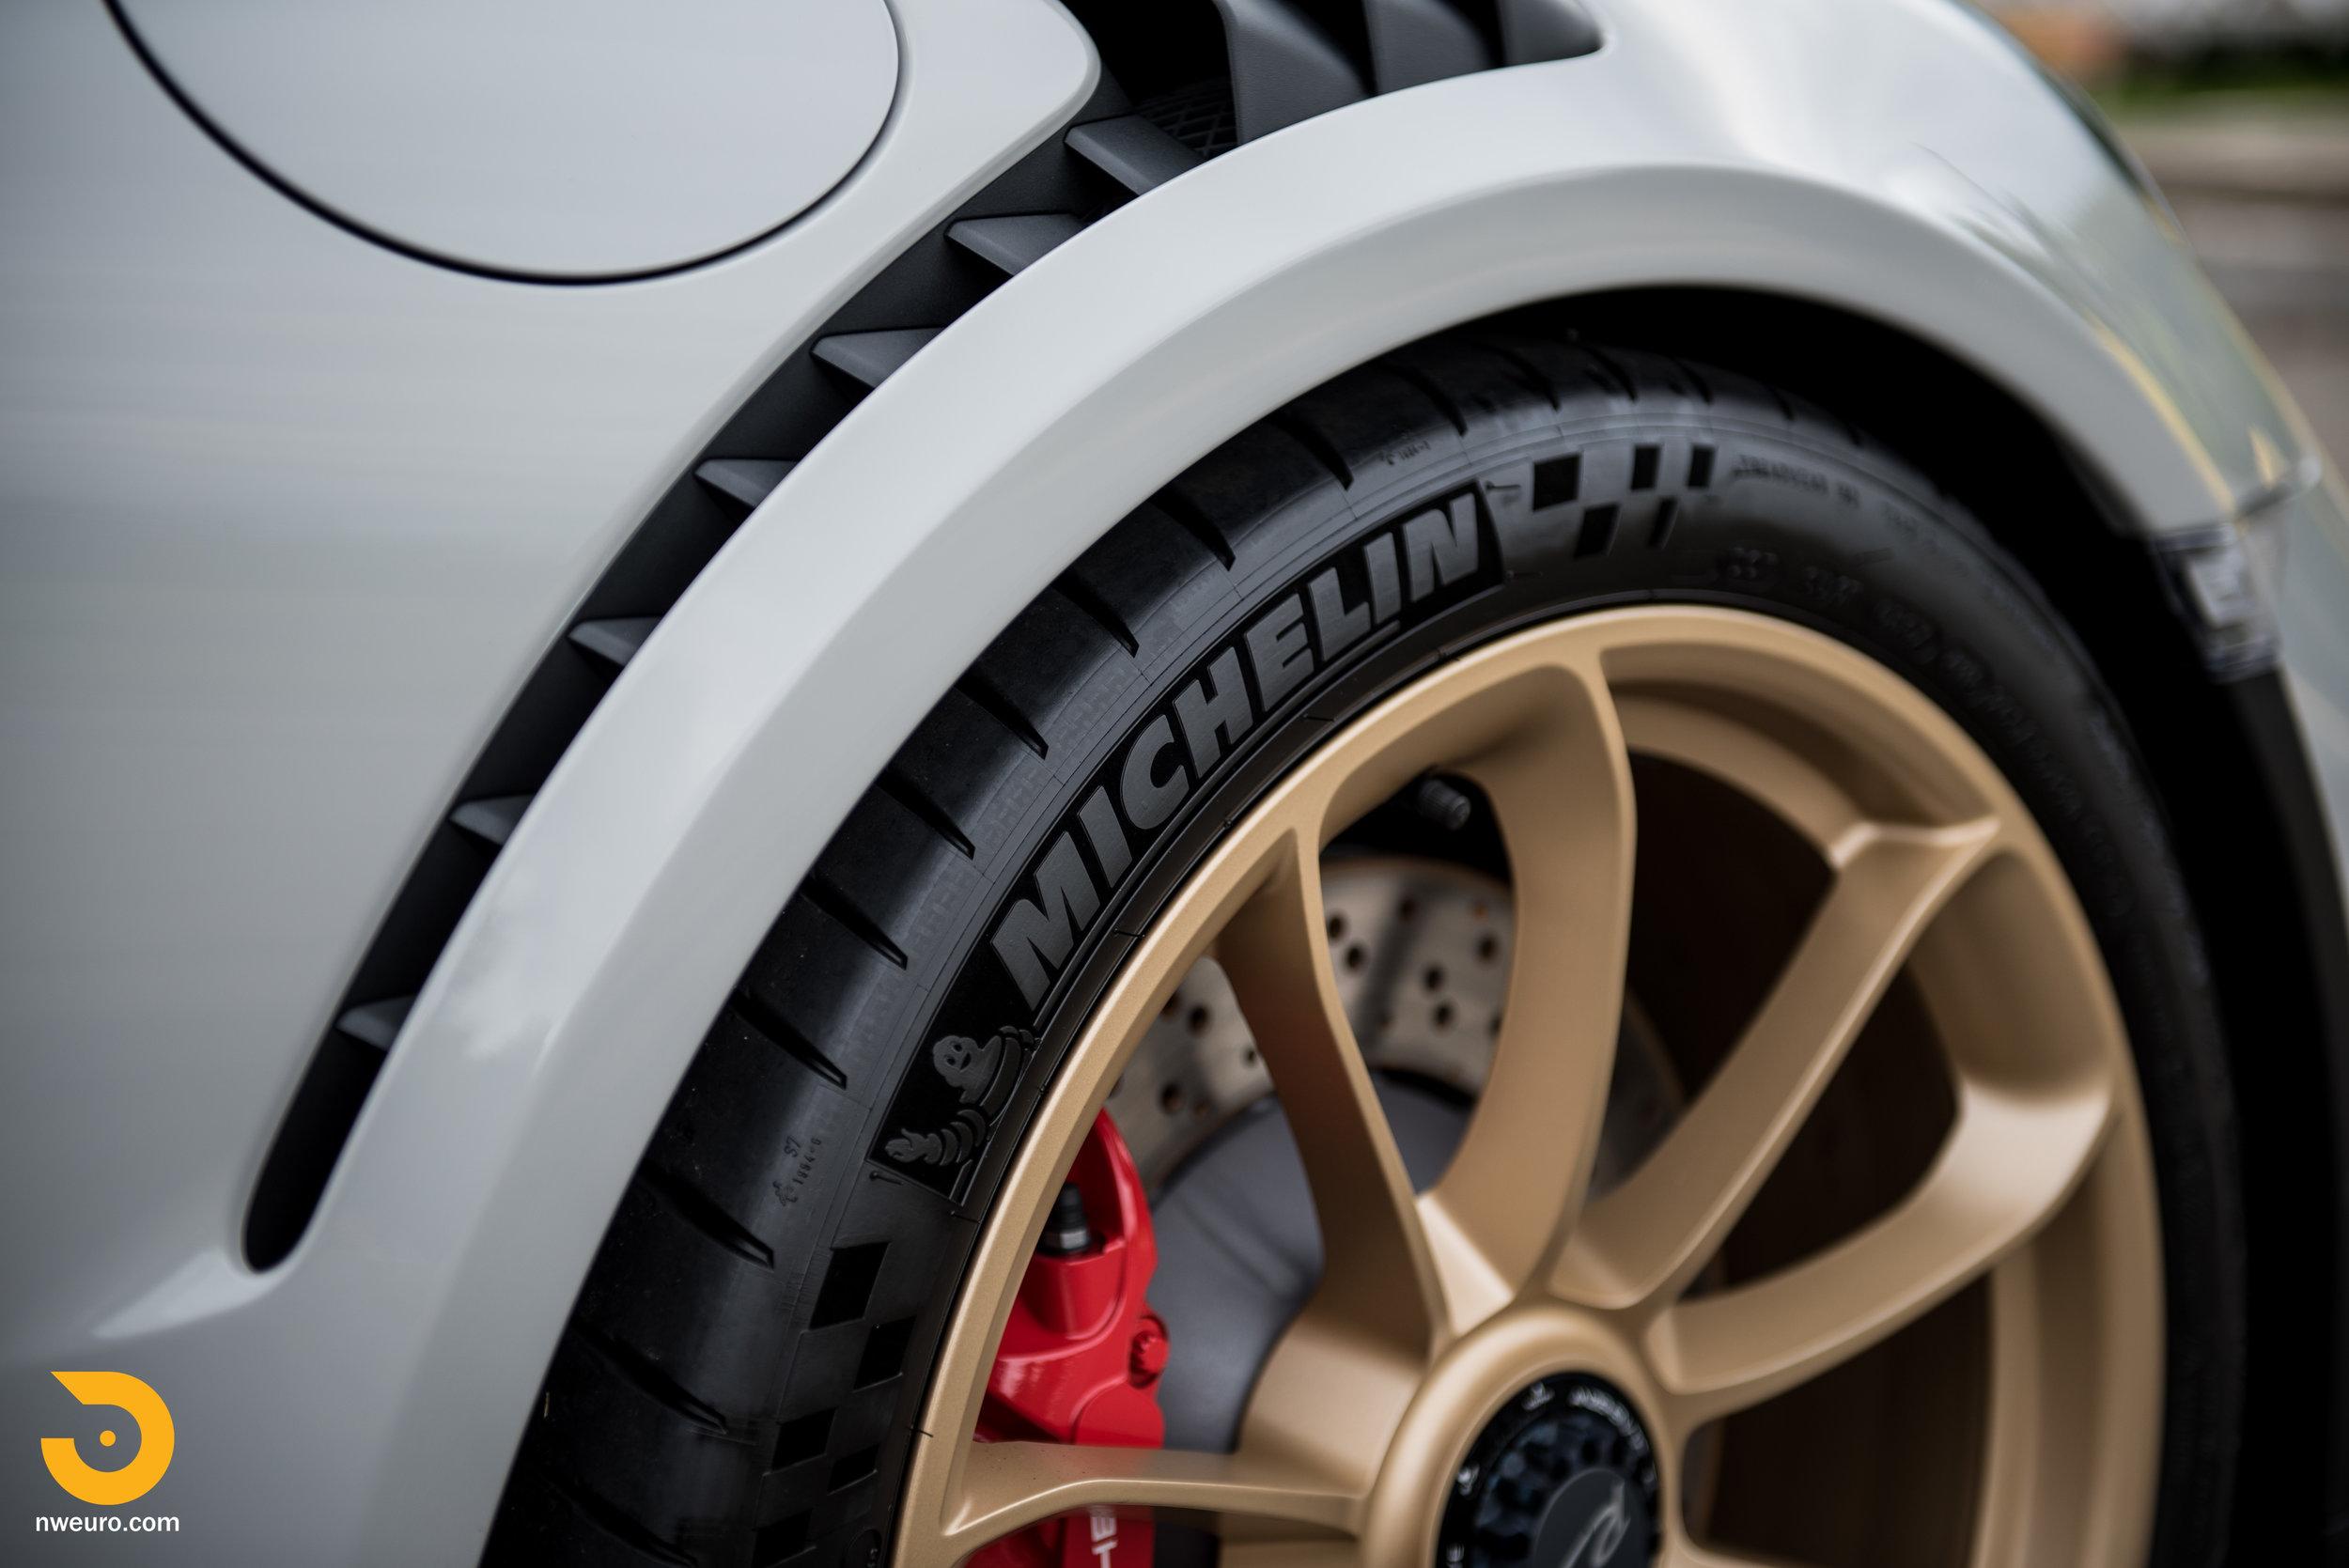 2019 Porsche GT3 RS - Chalk-4.jpg